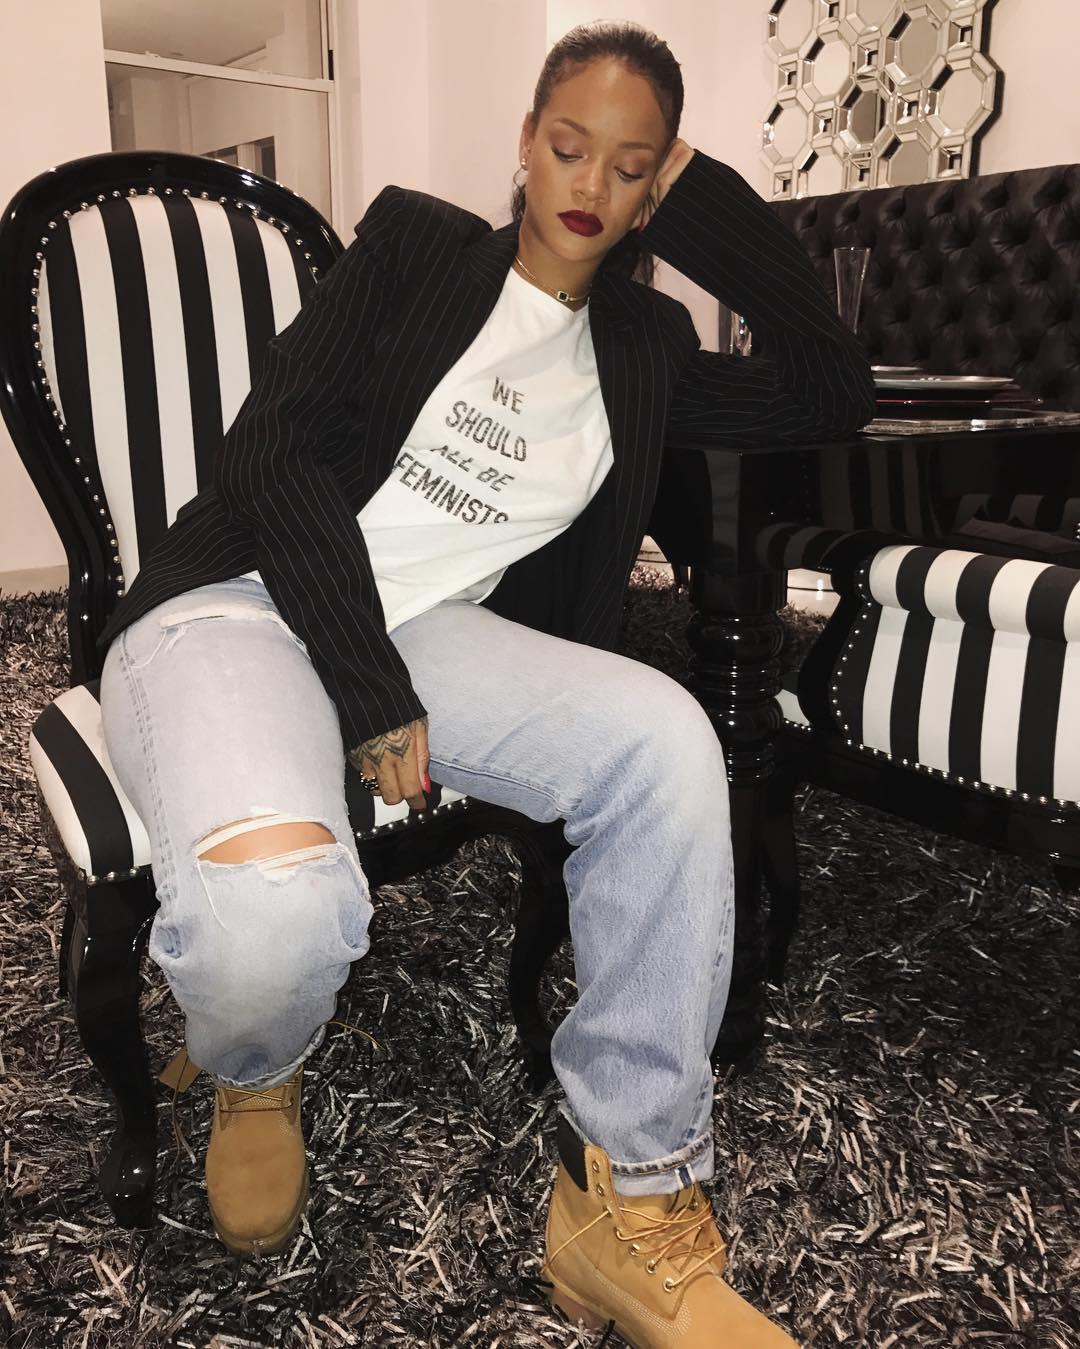 Rihanna wearing Dior's 'We Should All Be Feminists' t-shirt. Photo via Instagram @badgalriri